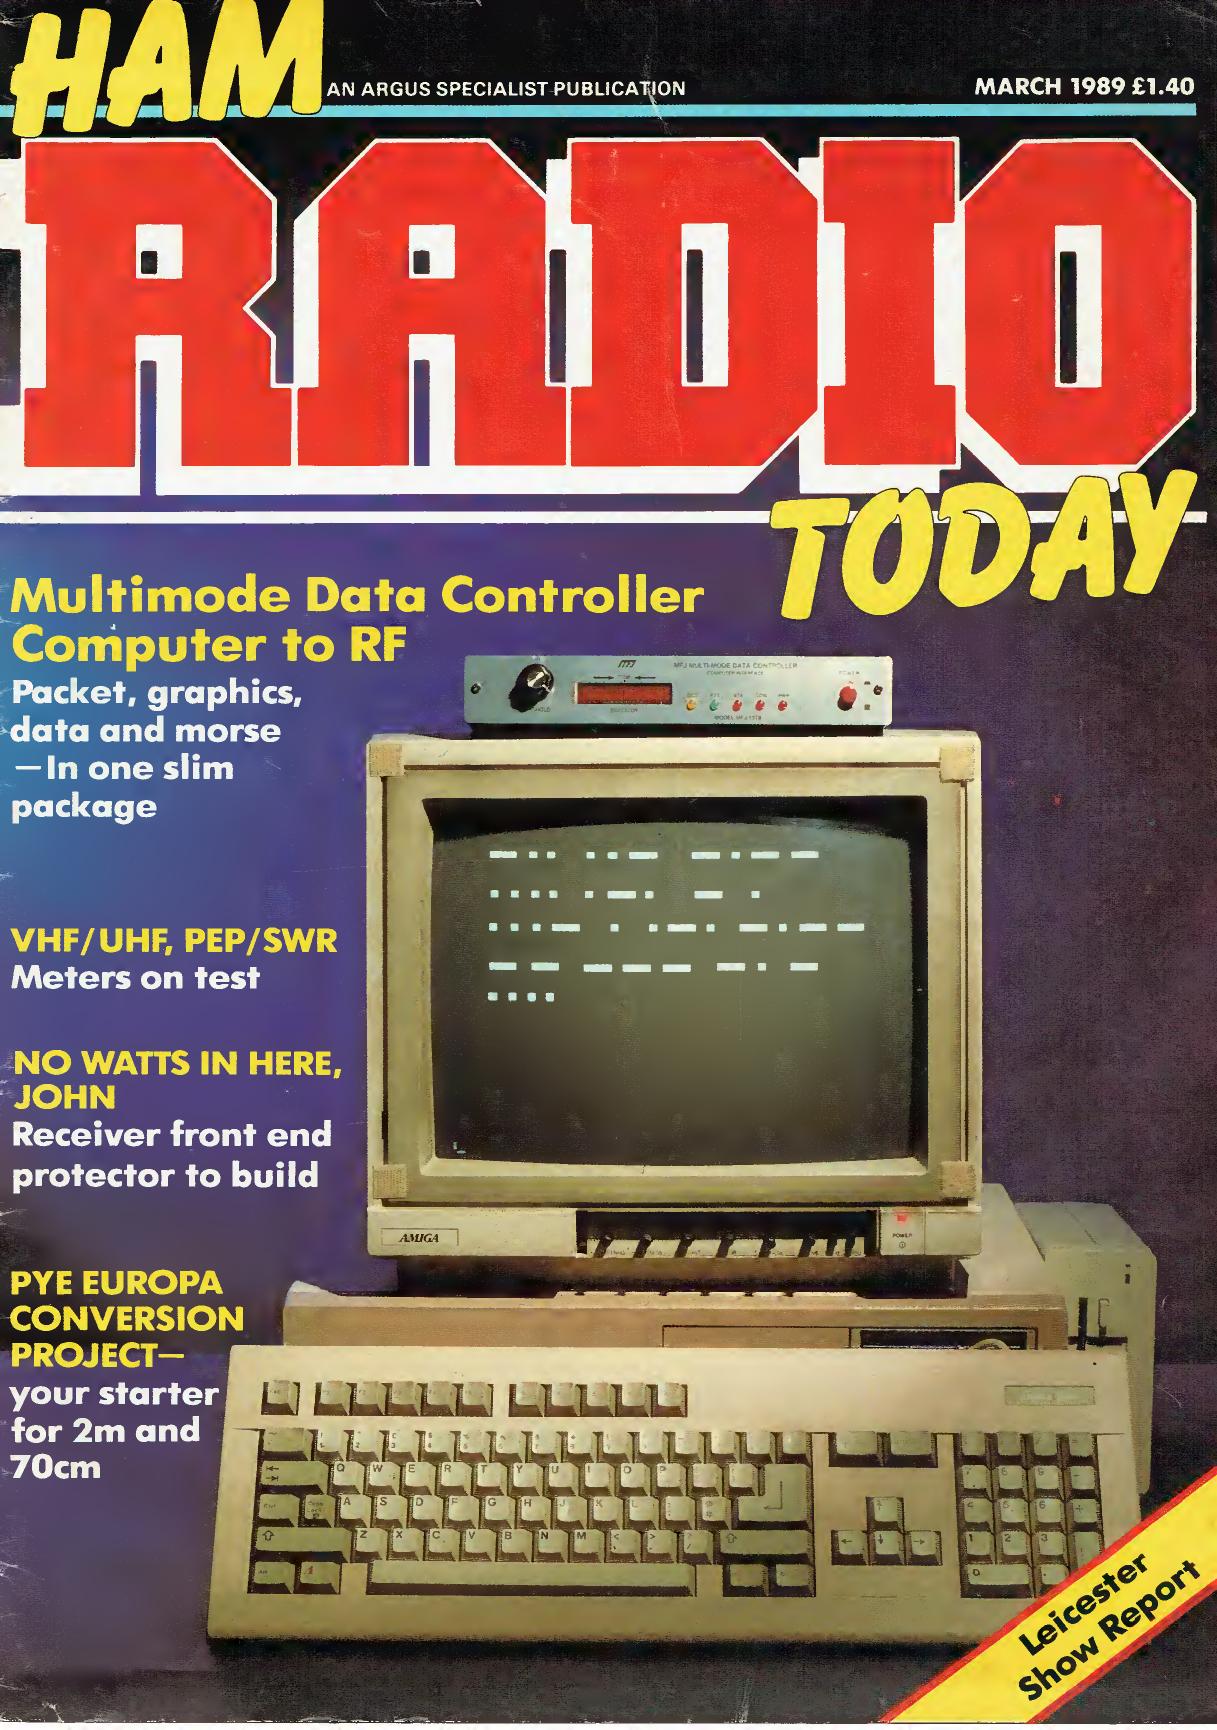 An Argus Specialist Publication March 1989 140 Daikin Ac Standard 1 Pk R32 Rv Ftv25axv14 Indoor Outdoor Only